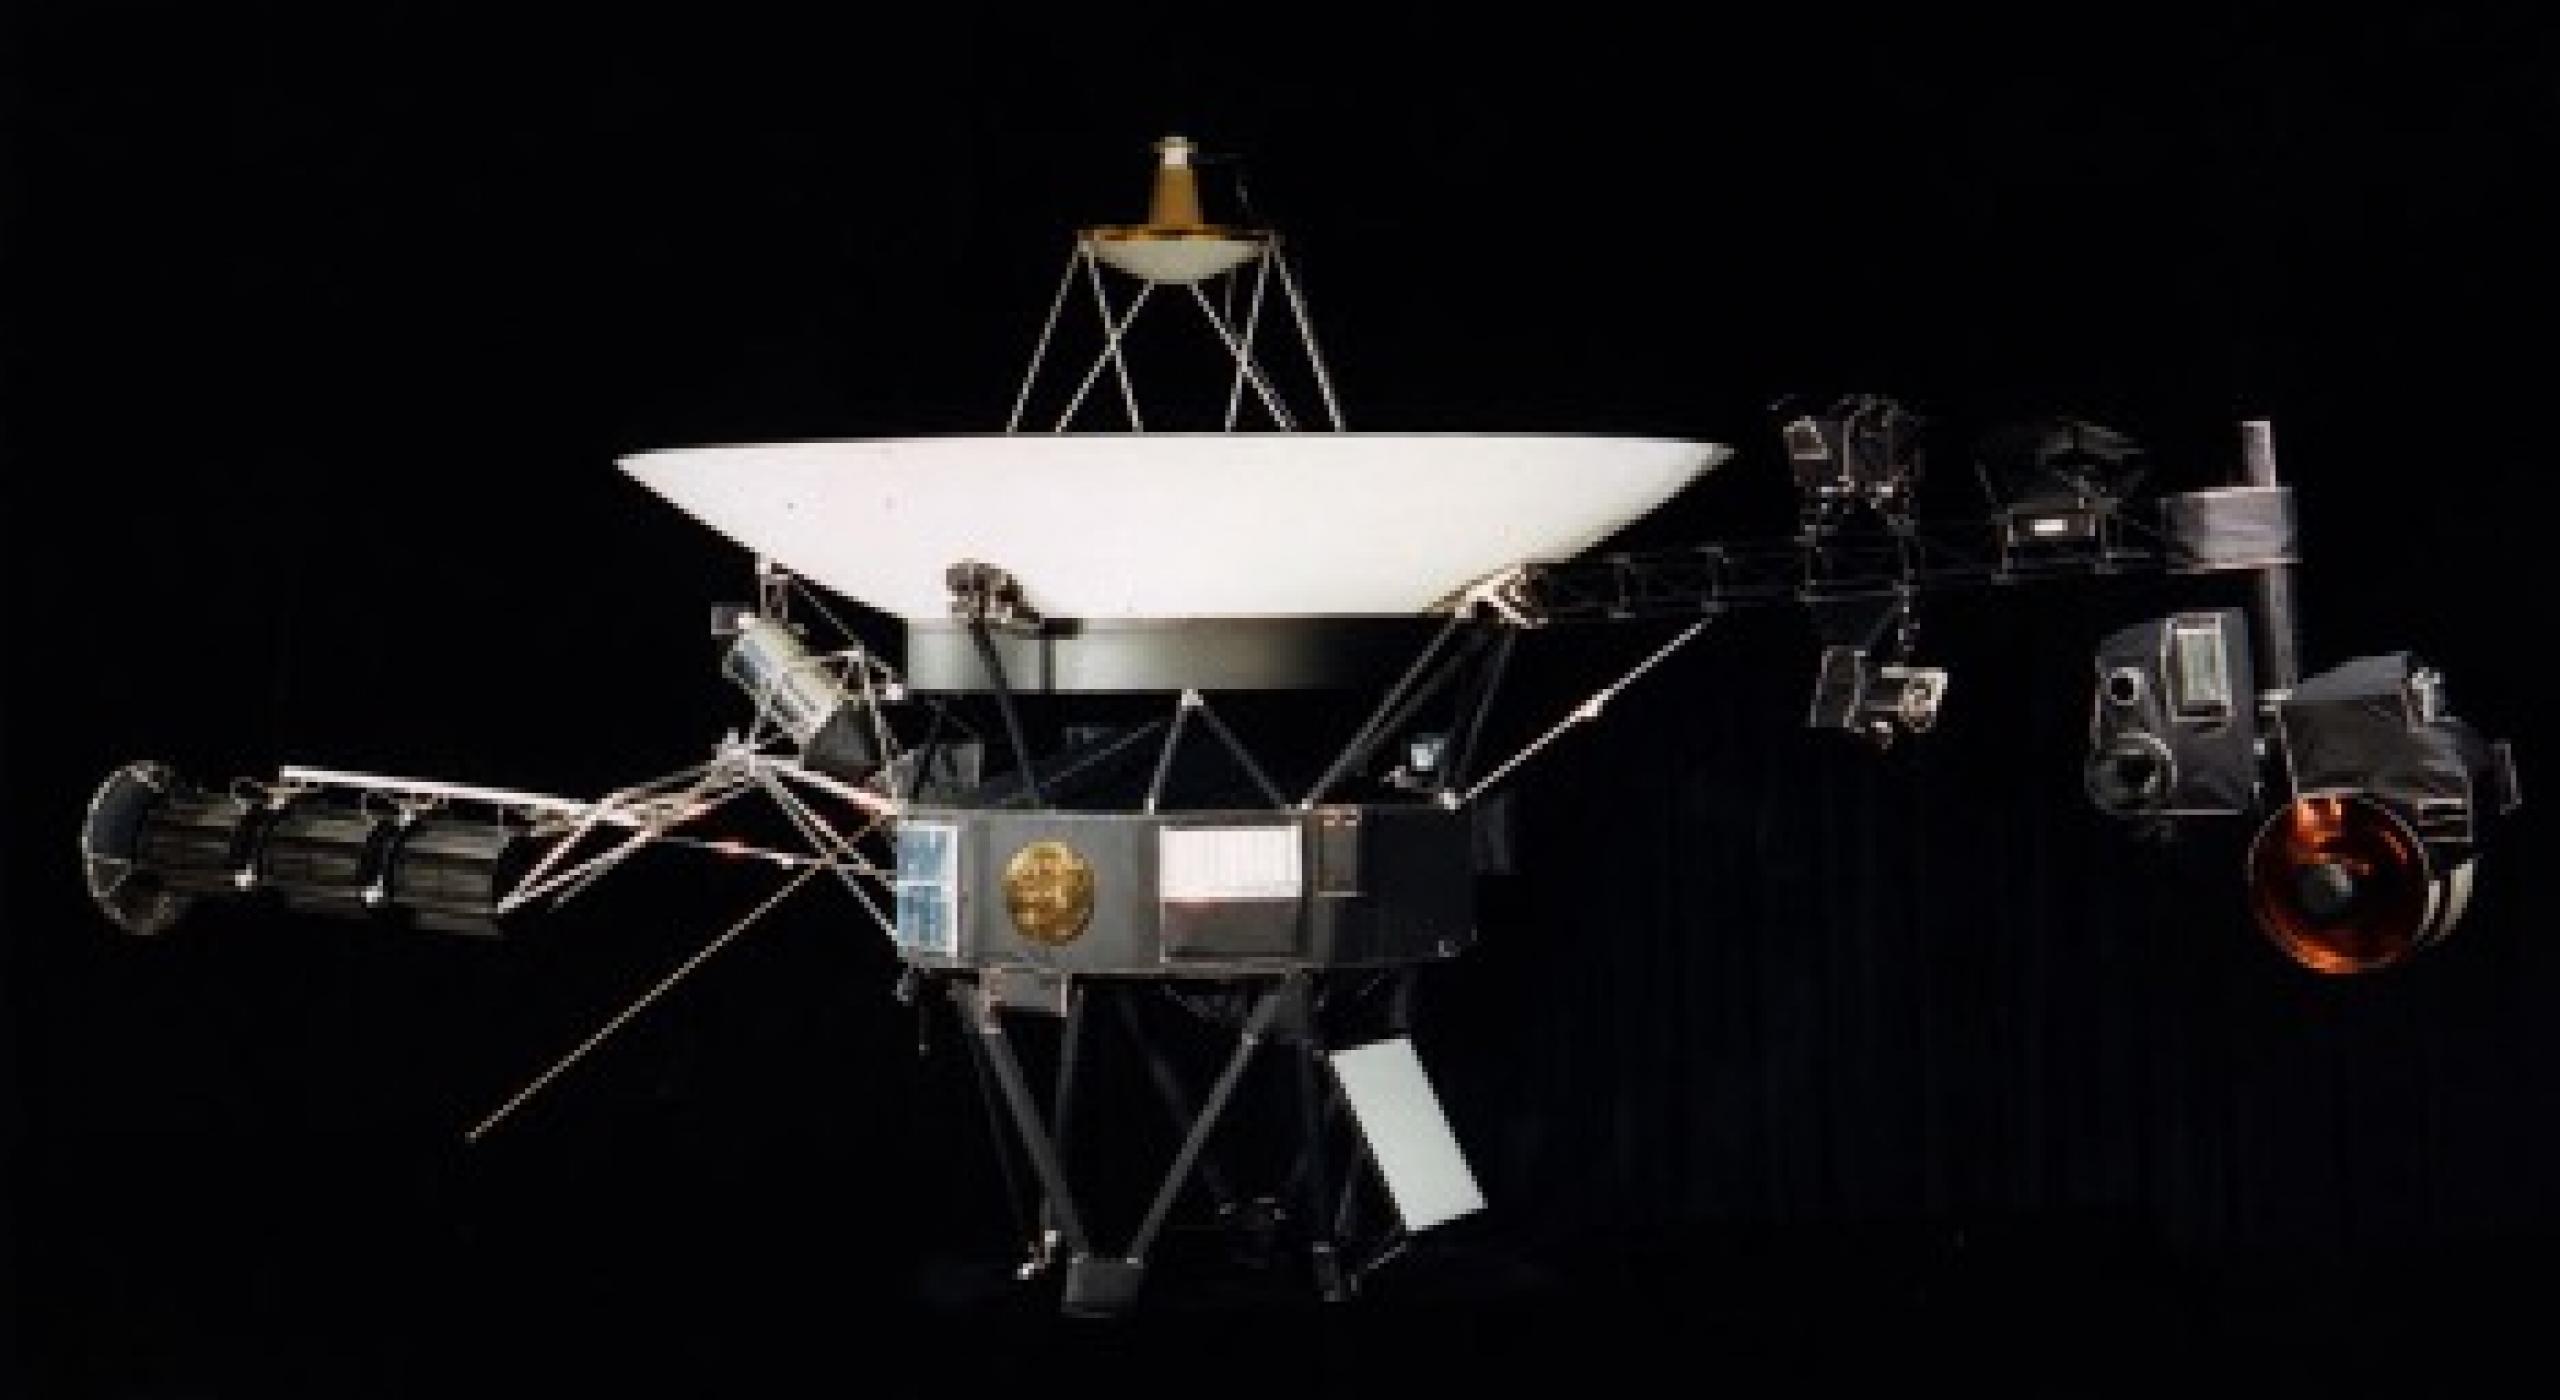 Artist concept of satellite against a black background